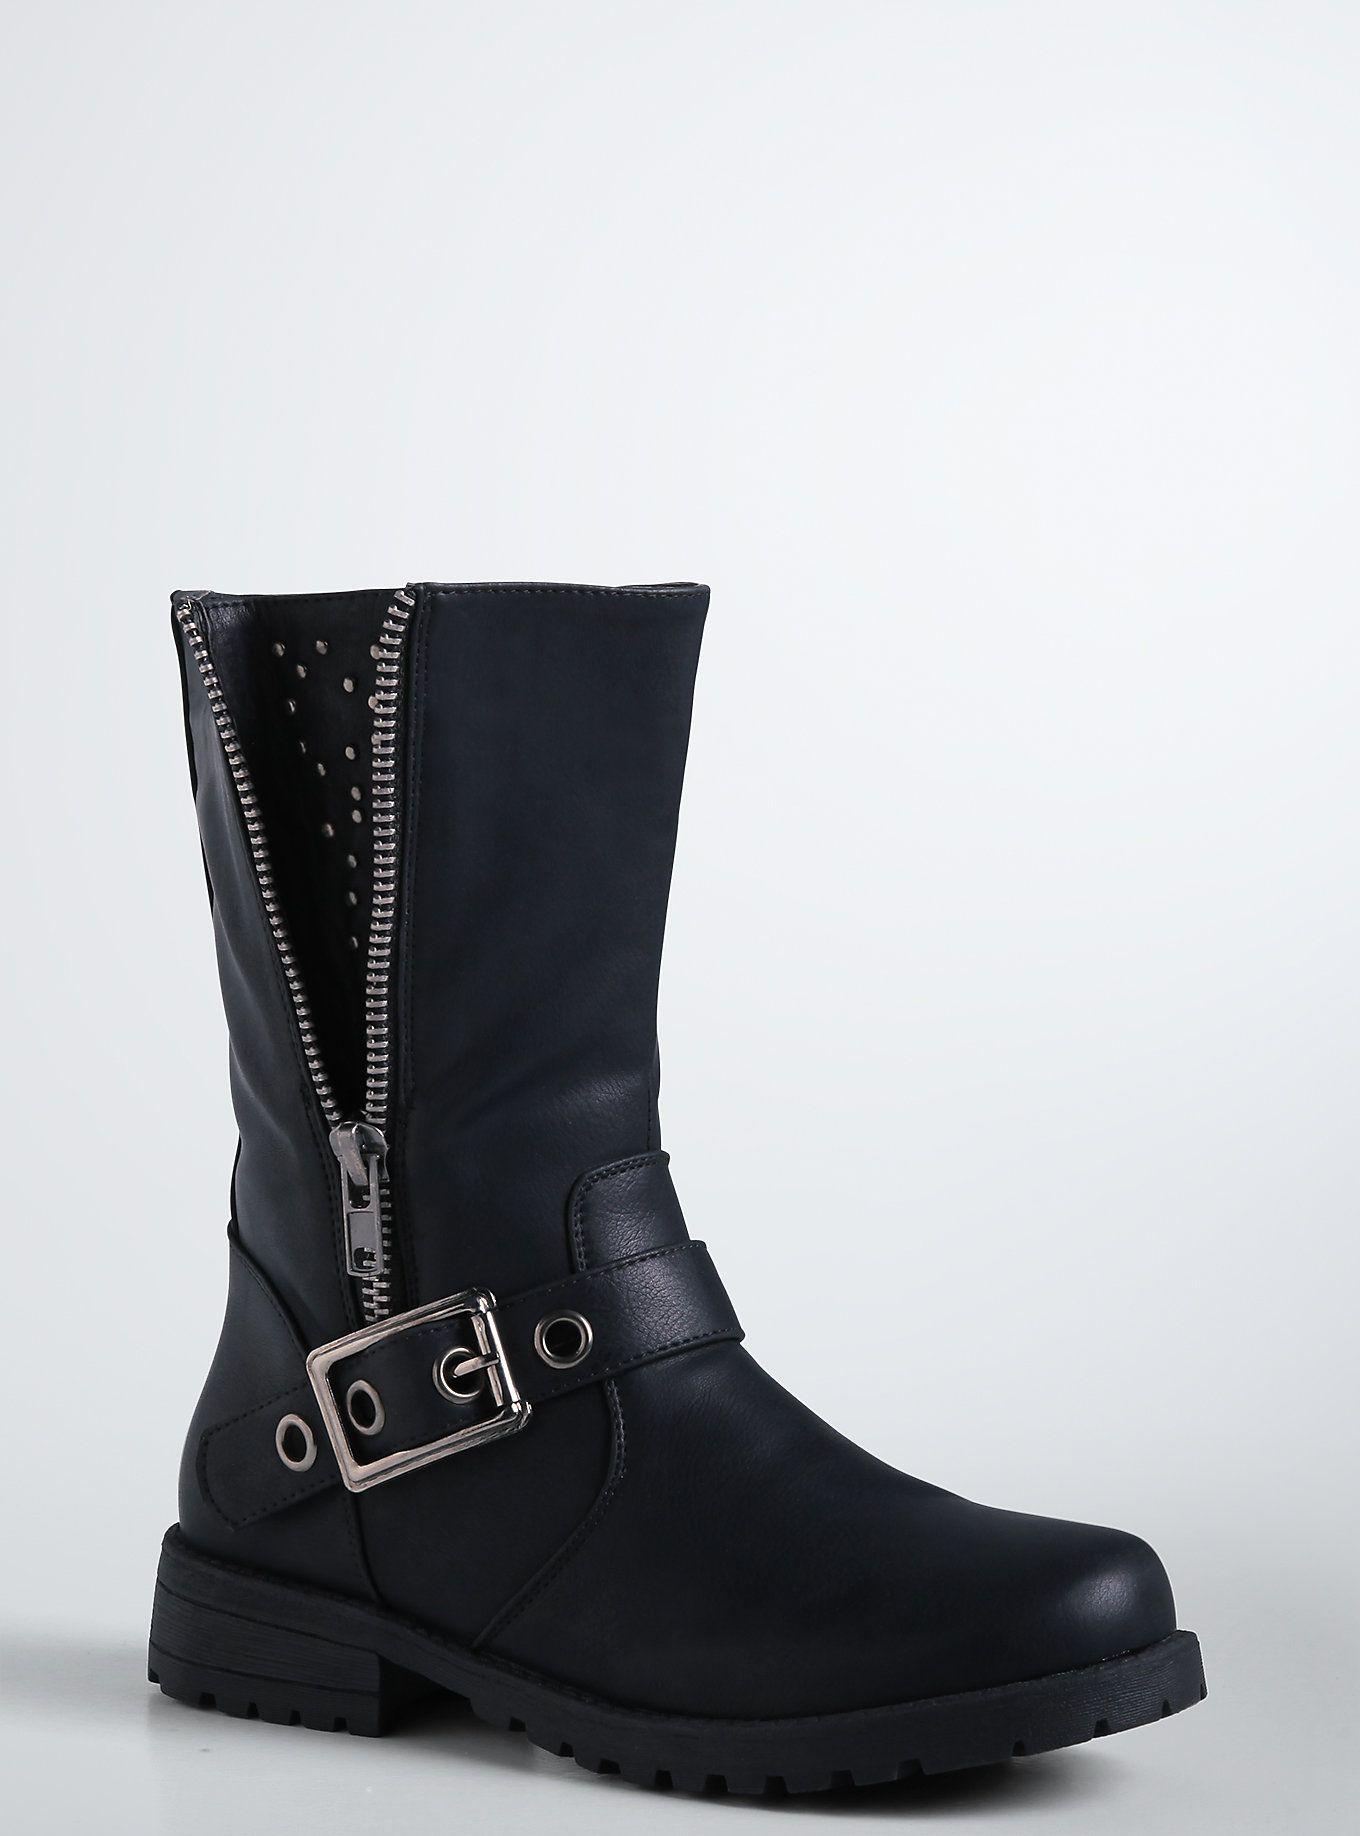 10e0fff78d72 Studded Side Zip Moto Boots (Wide Width)